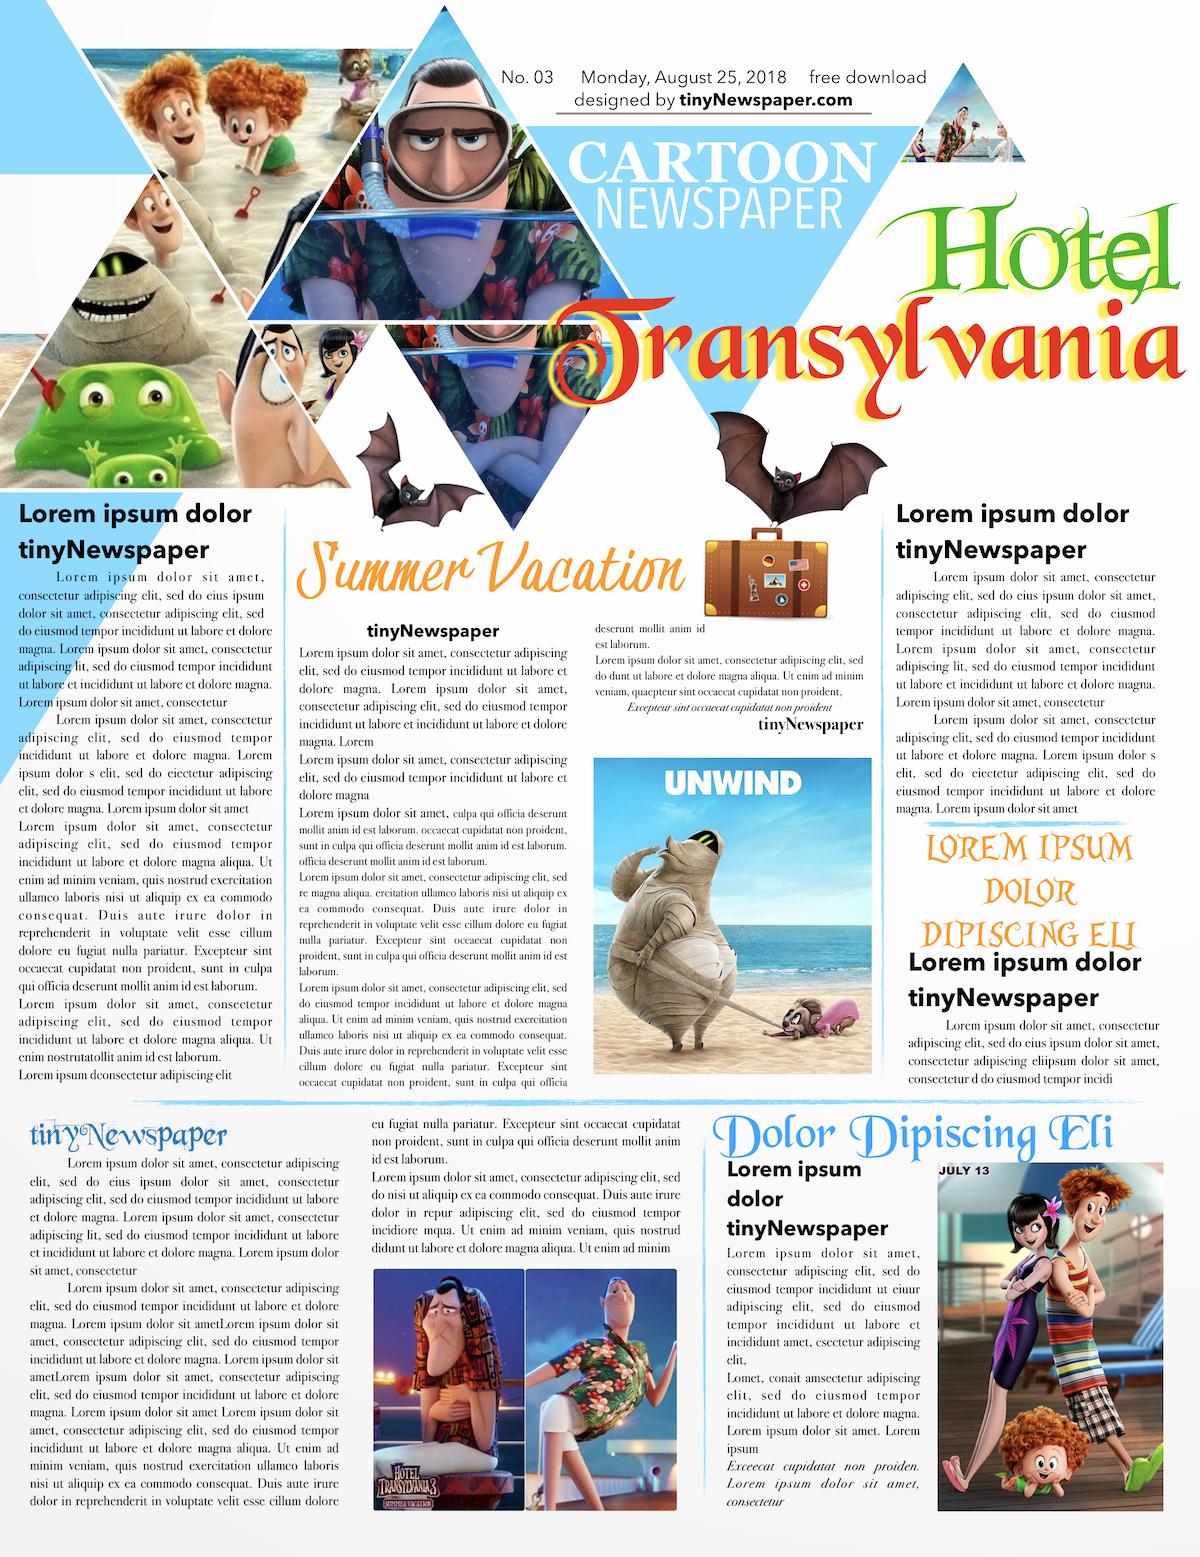 Newsletter Templates Google Docs Fresh Newspaper Template Google Docs Newspaper Layout Newspaper